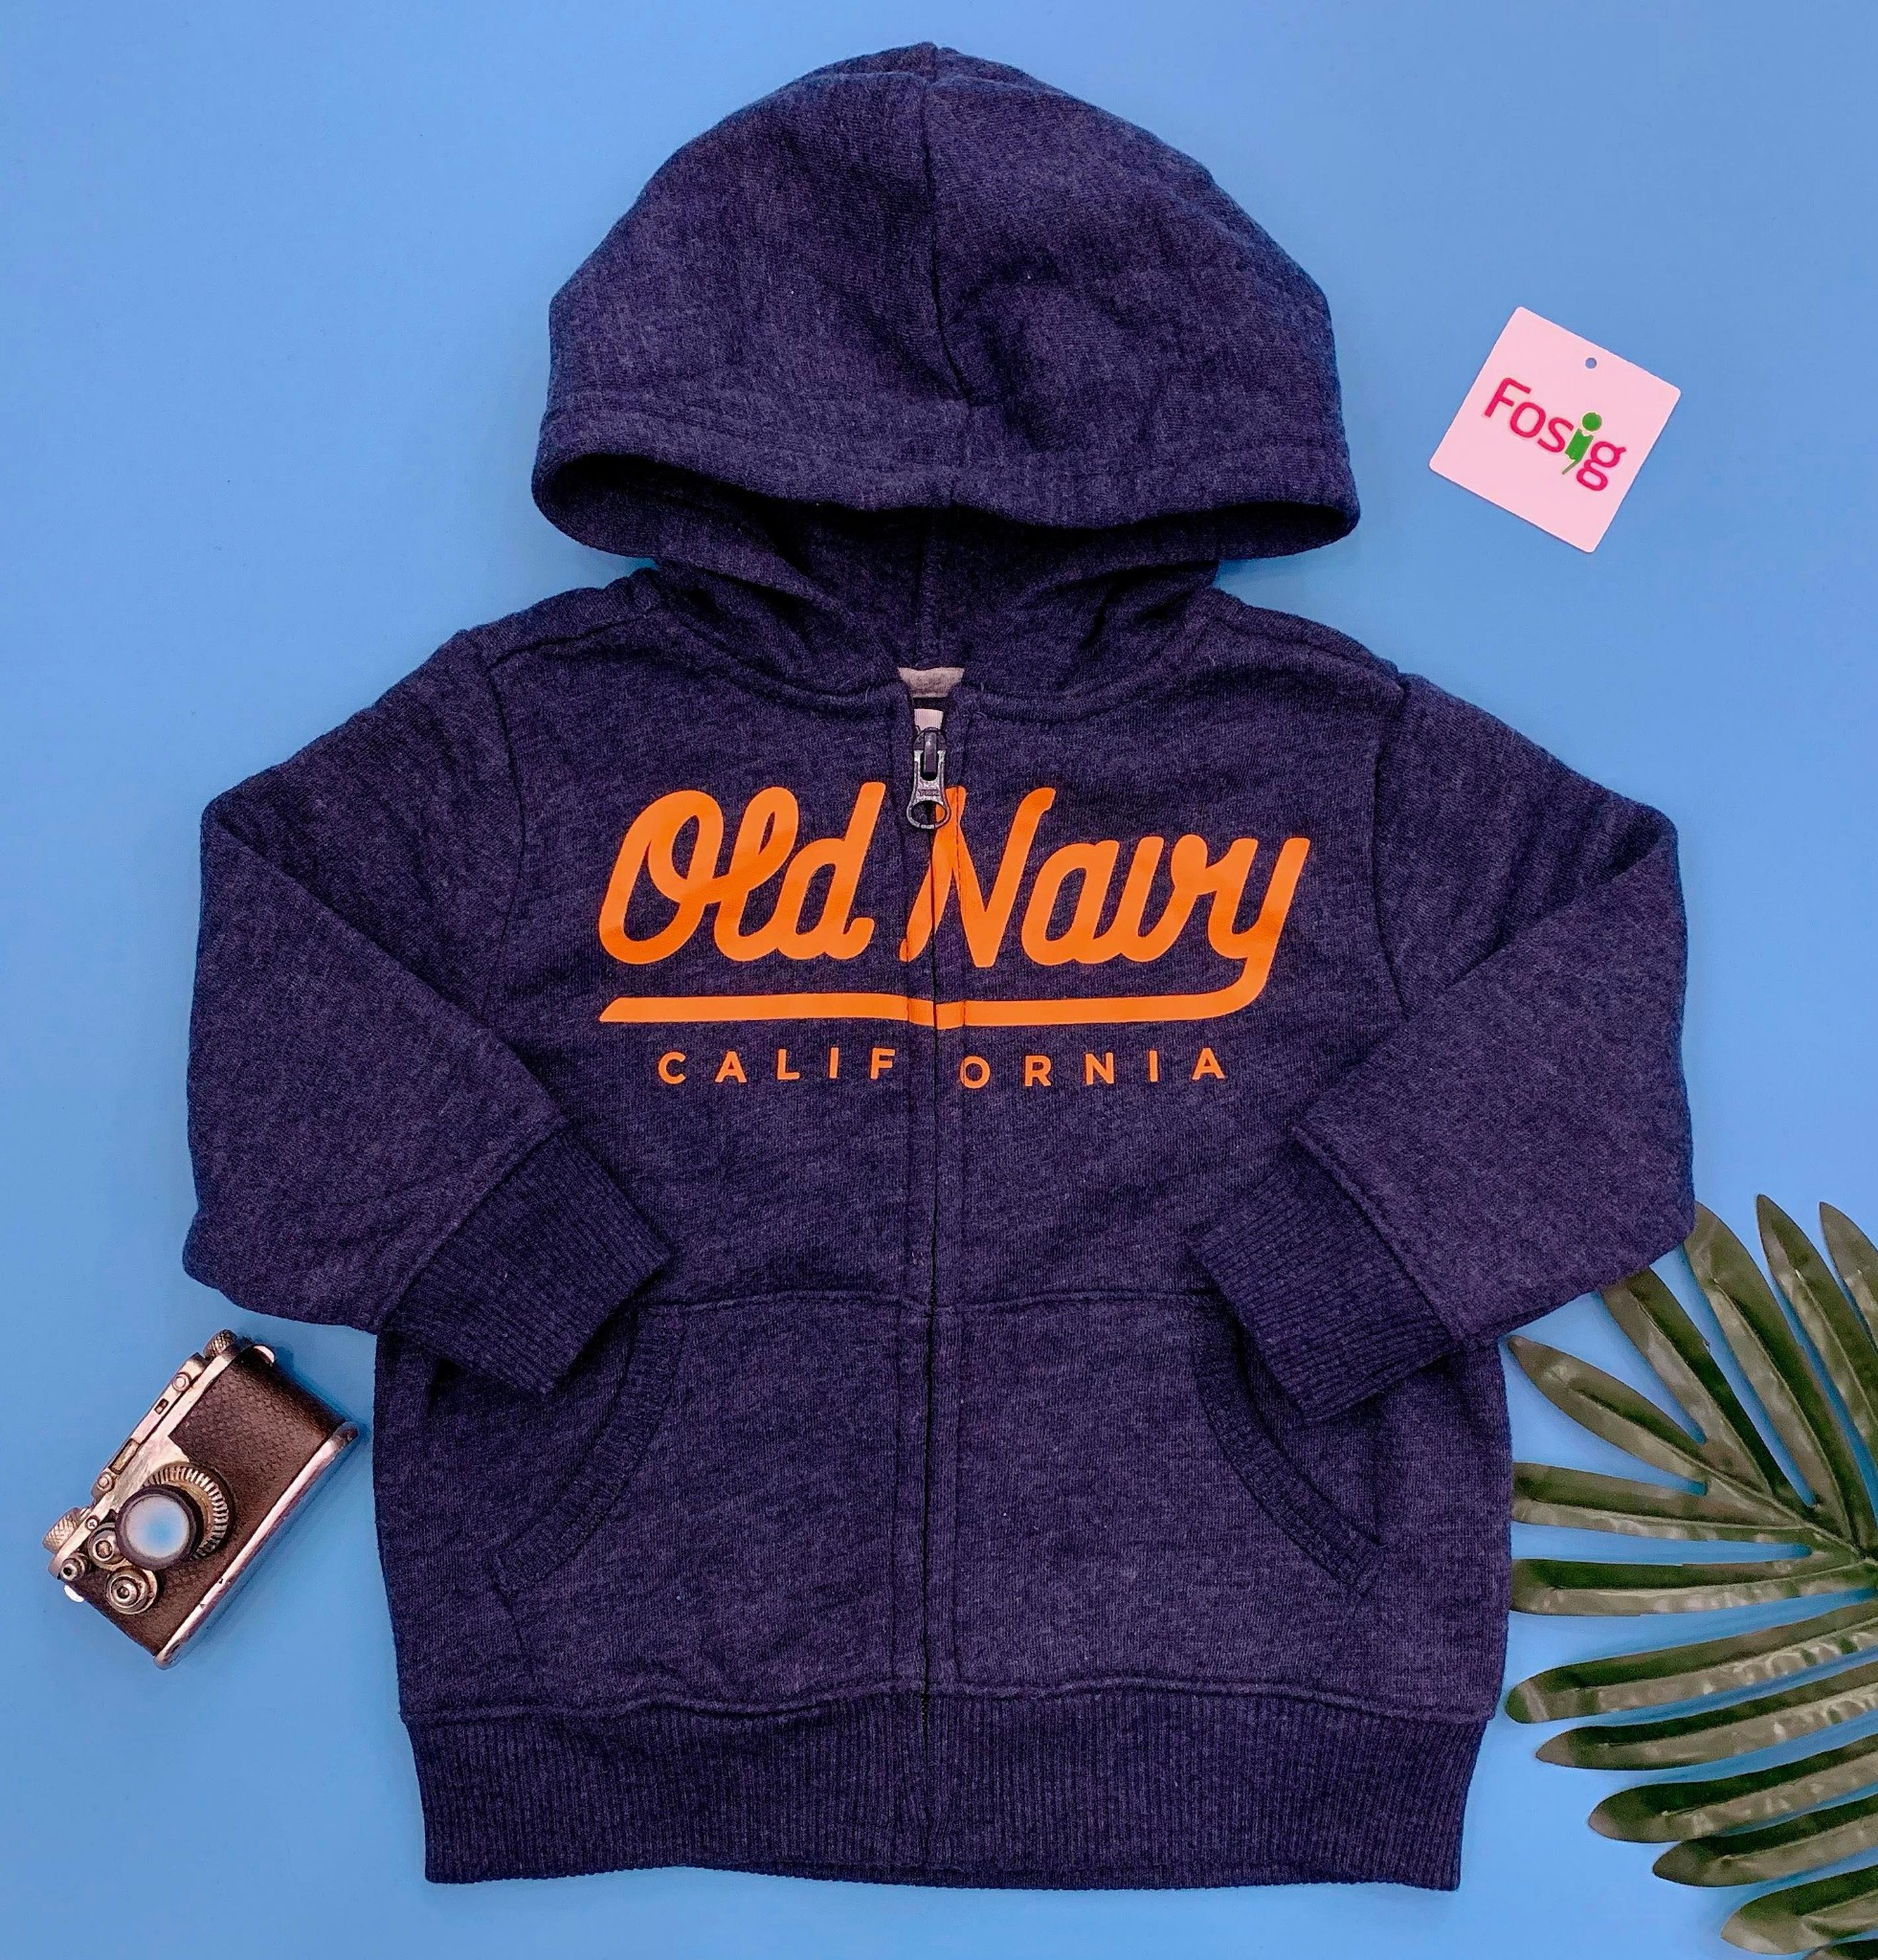 [9-17kg] Áo Khoác Old Navy [Boy] - Xanh Xám/Old Navy Cam